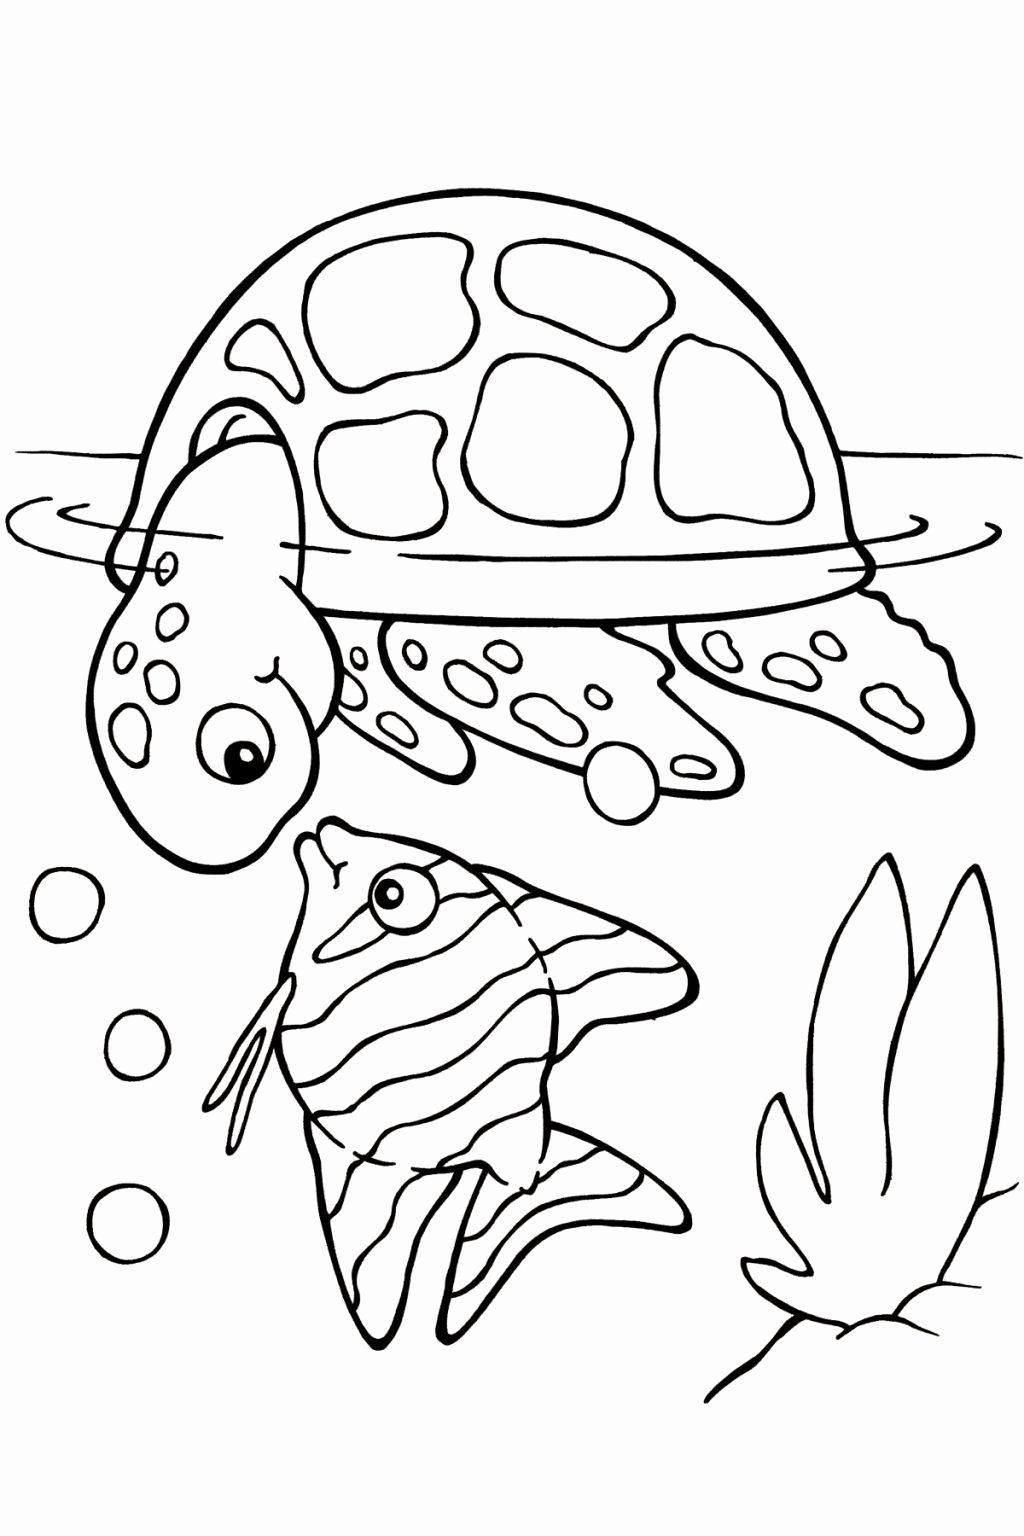 Free Printable Turtle Coloring Pages Cinebrique